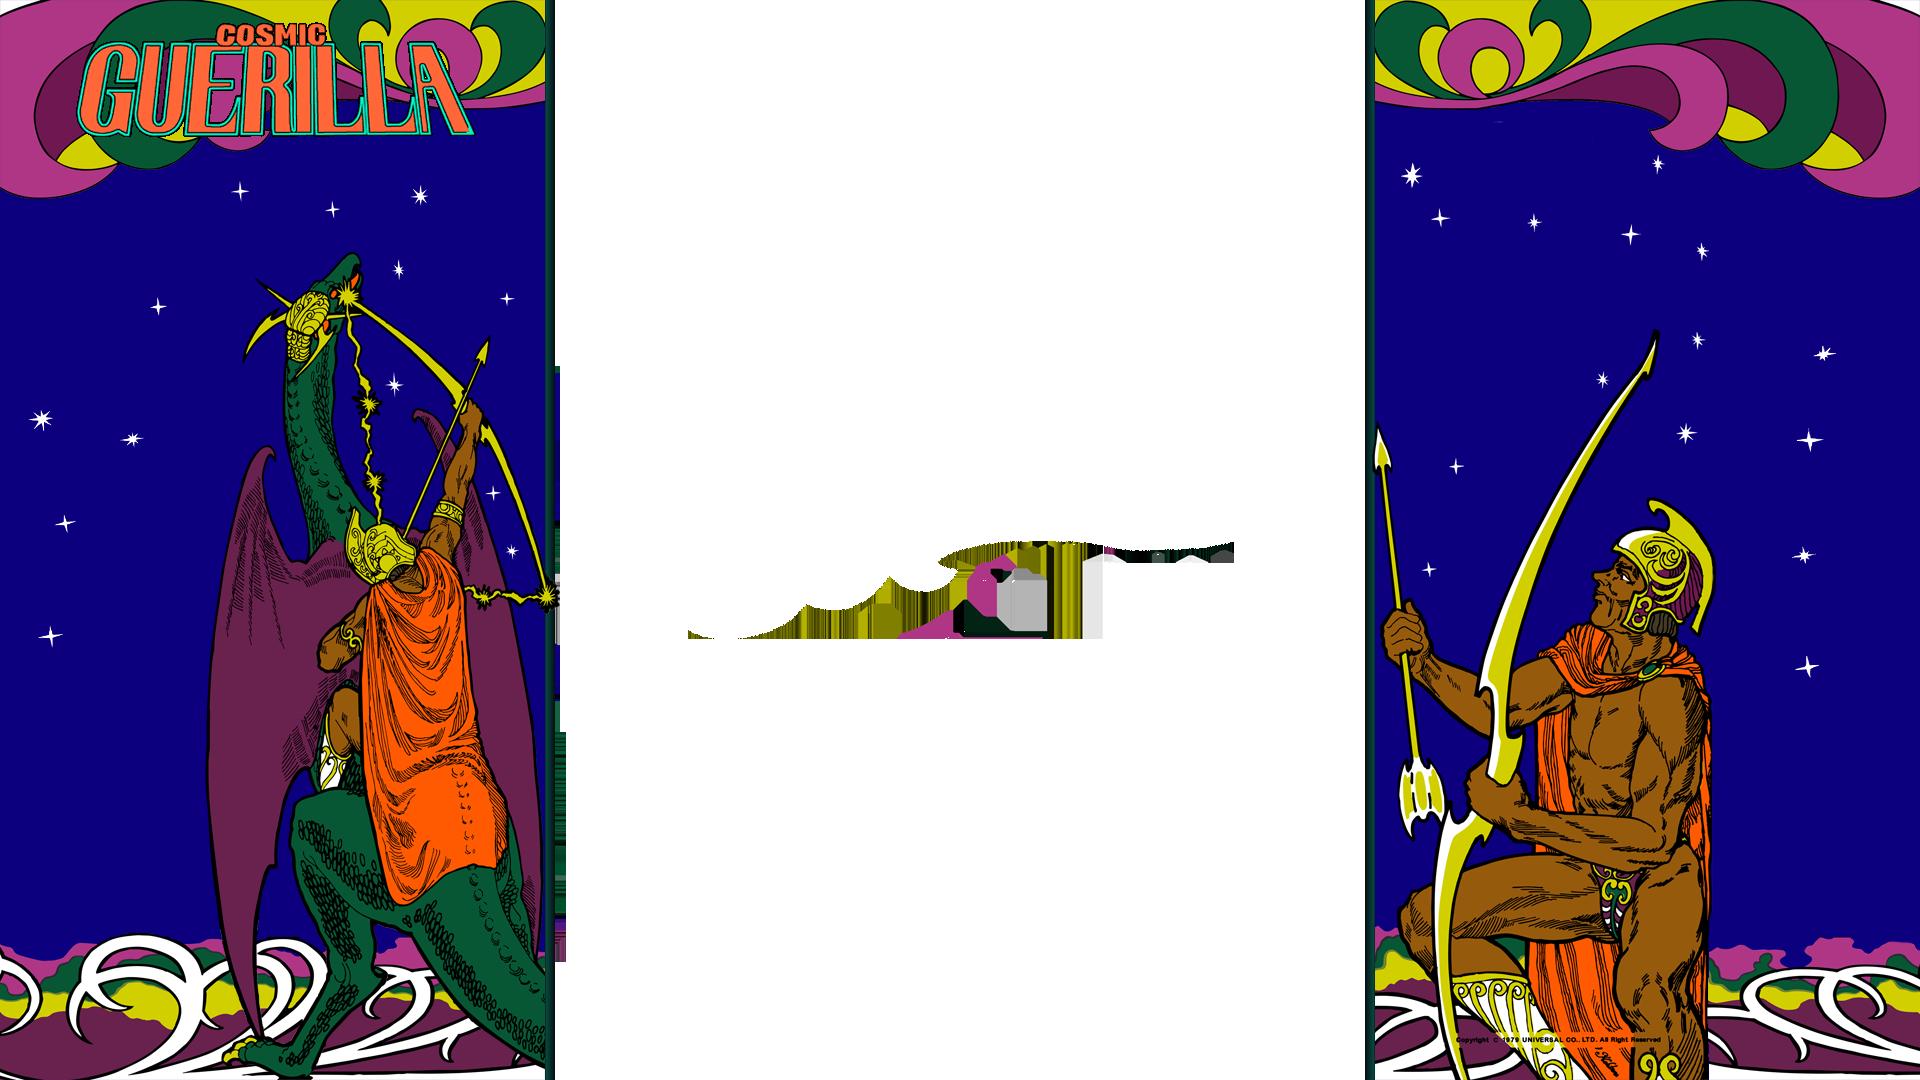 Cosmic Guerilla 1080p overlay